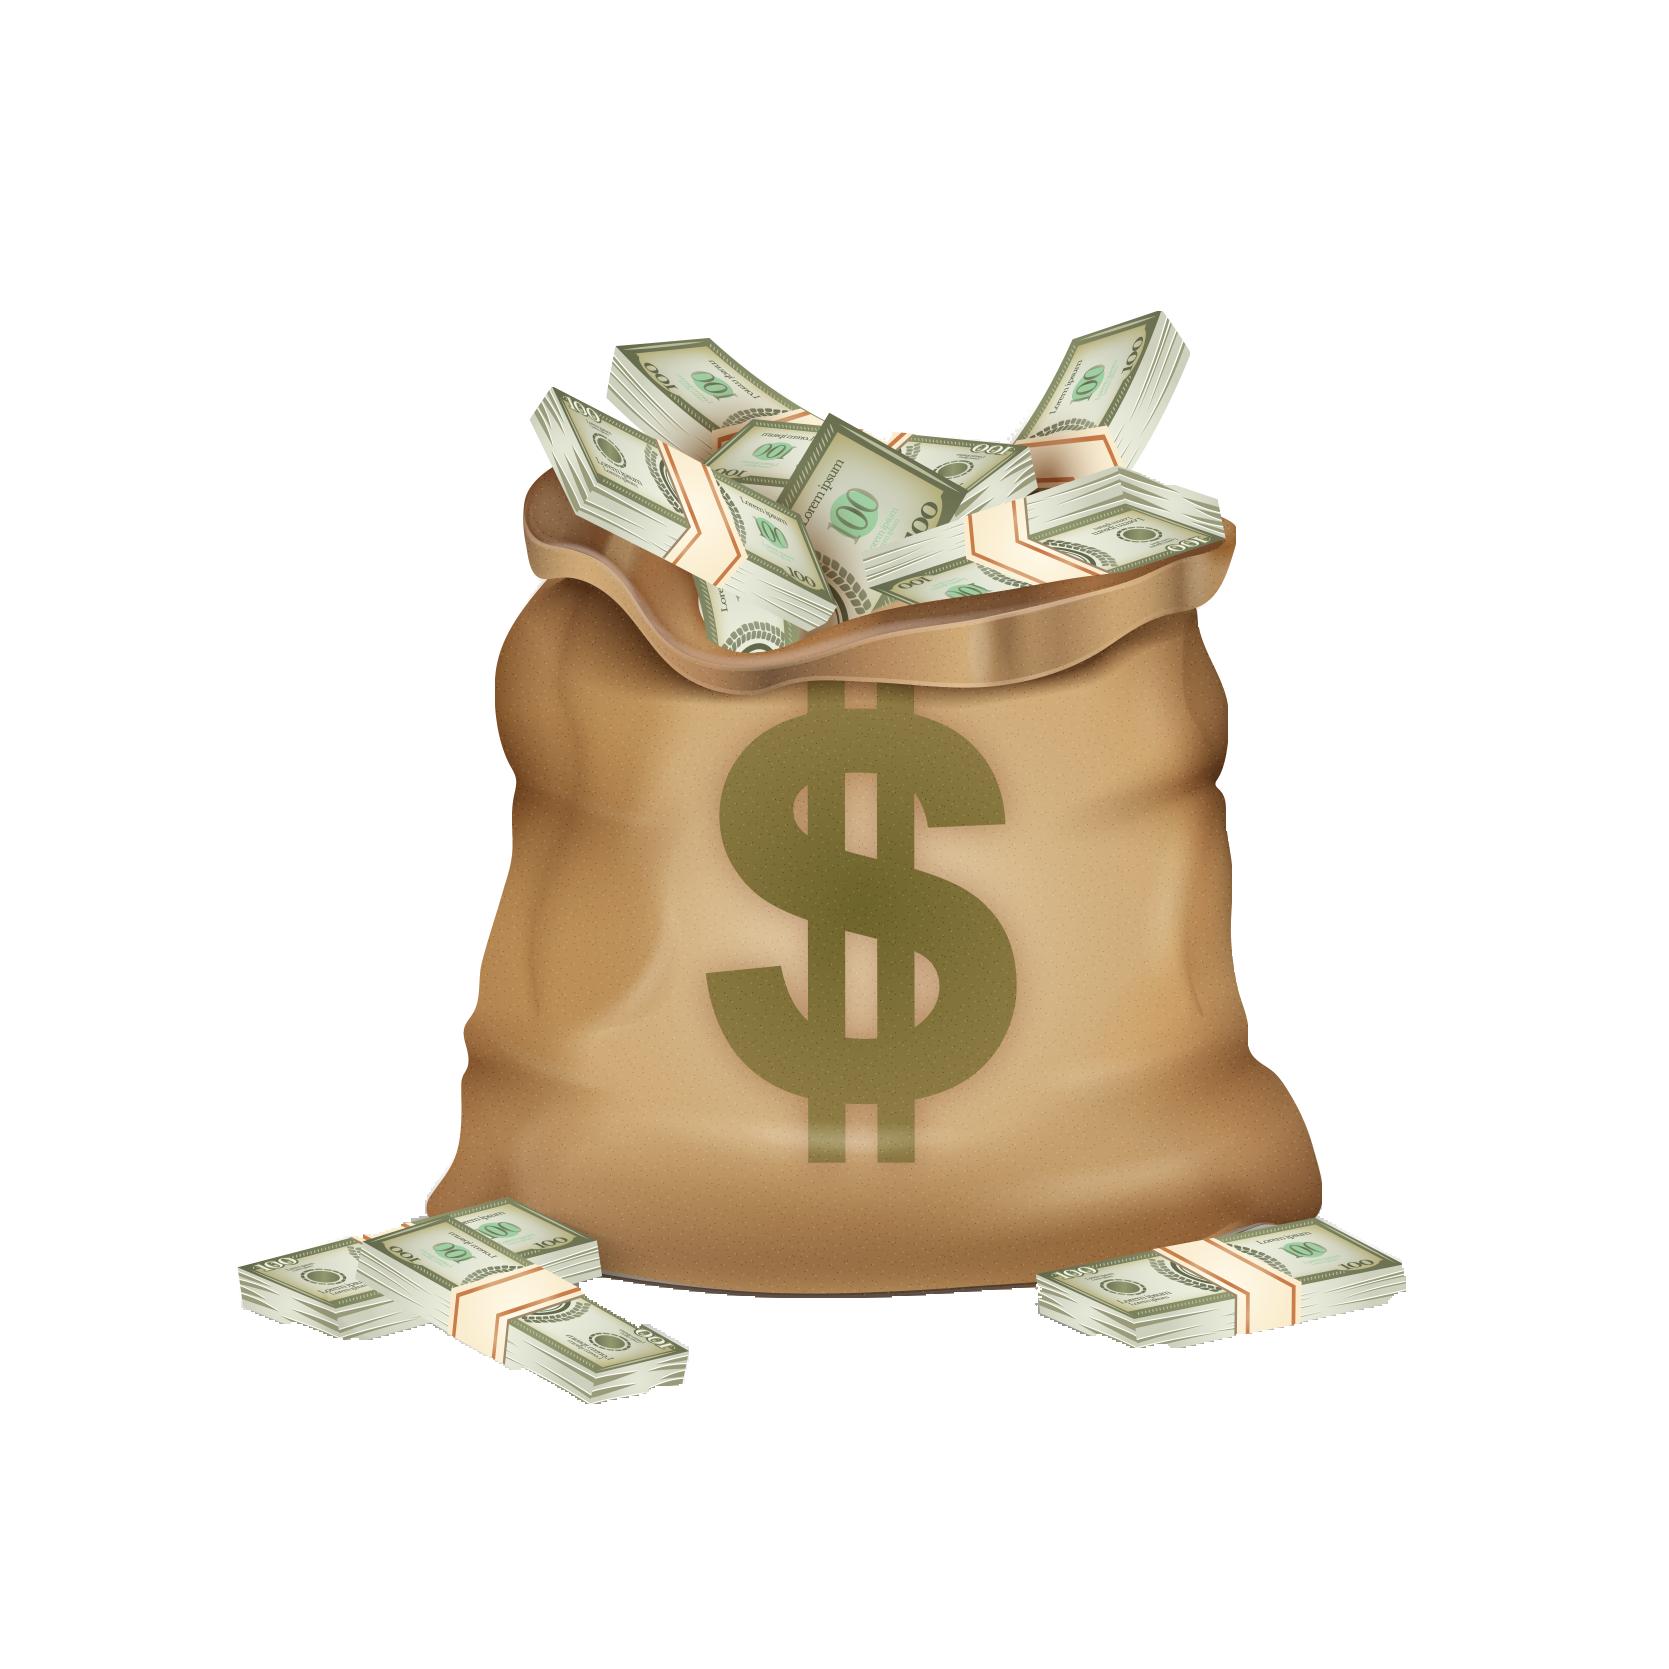 Coins clipart bag full money. Dollar sign coin purse